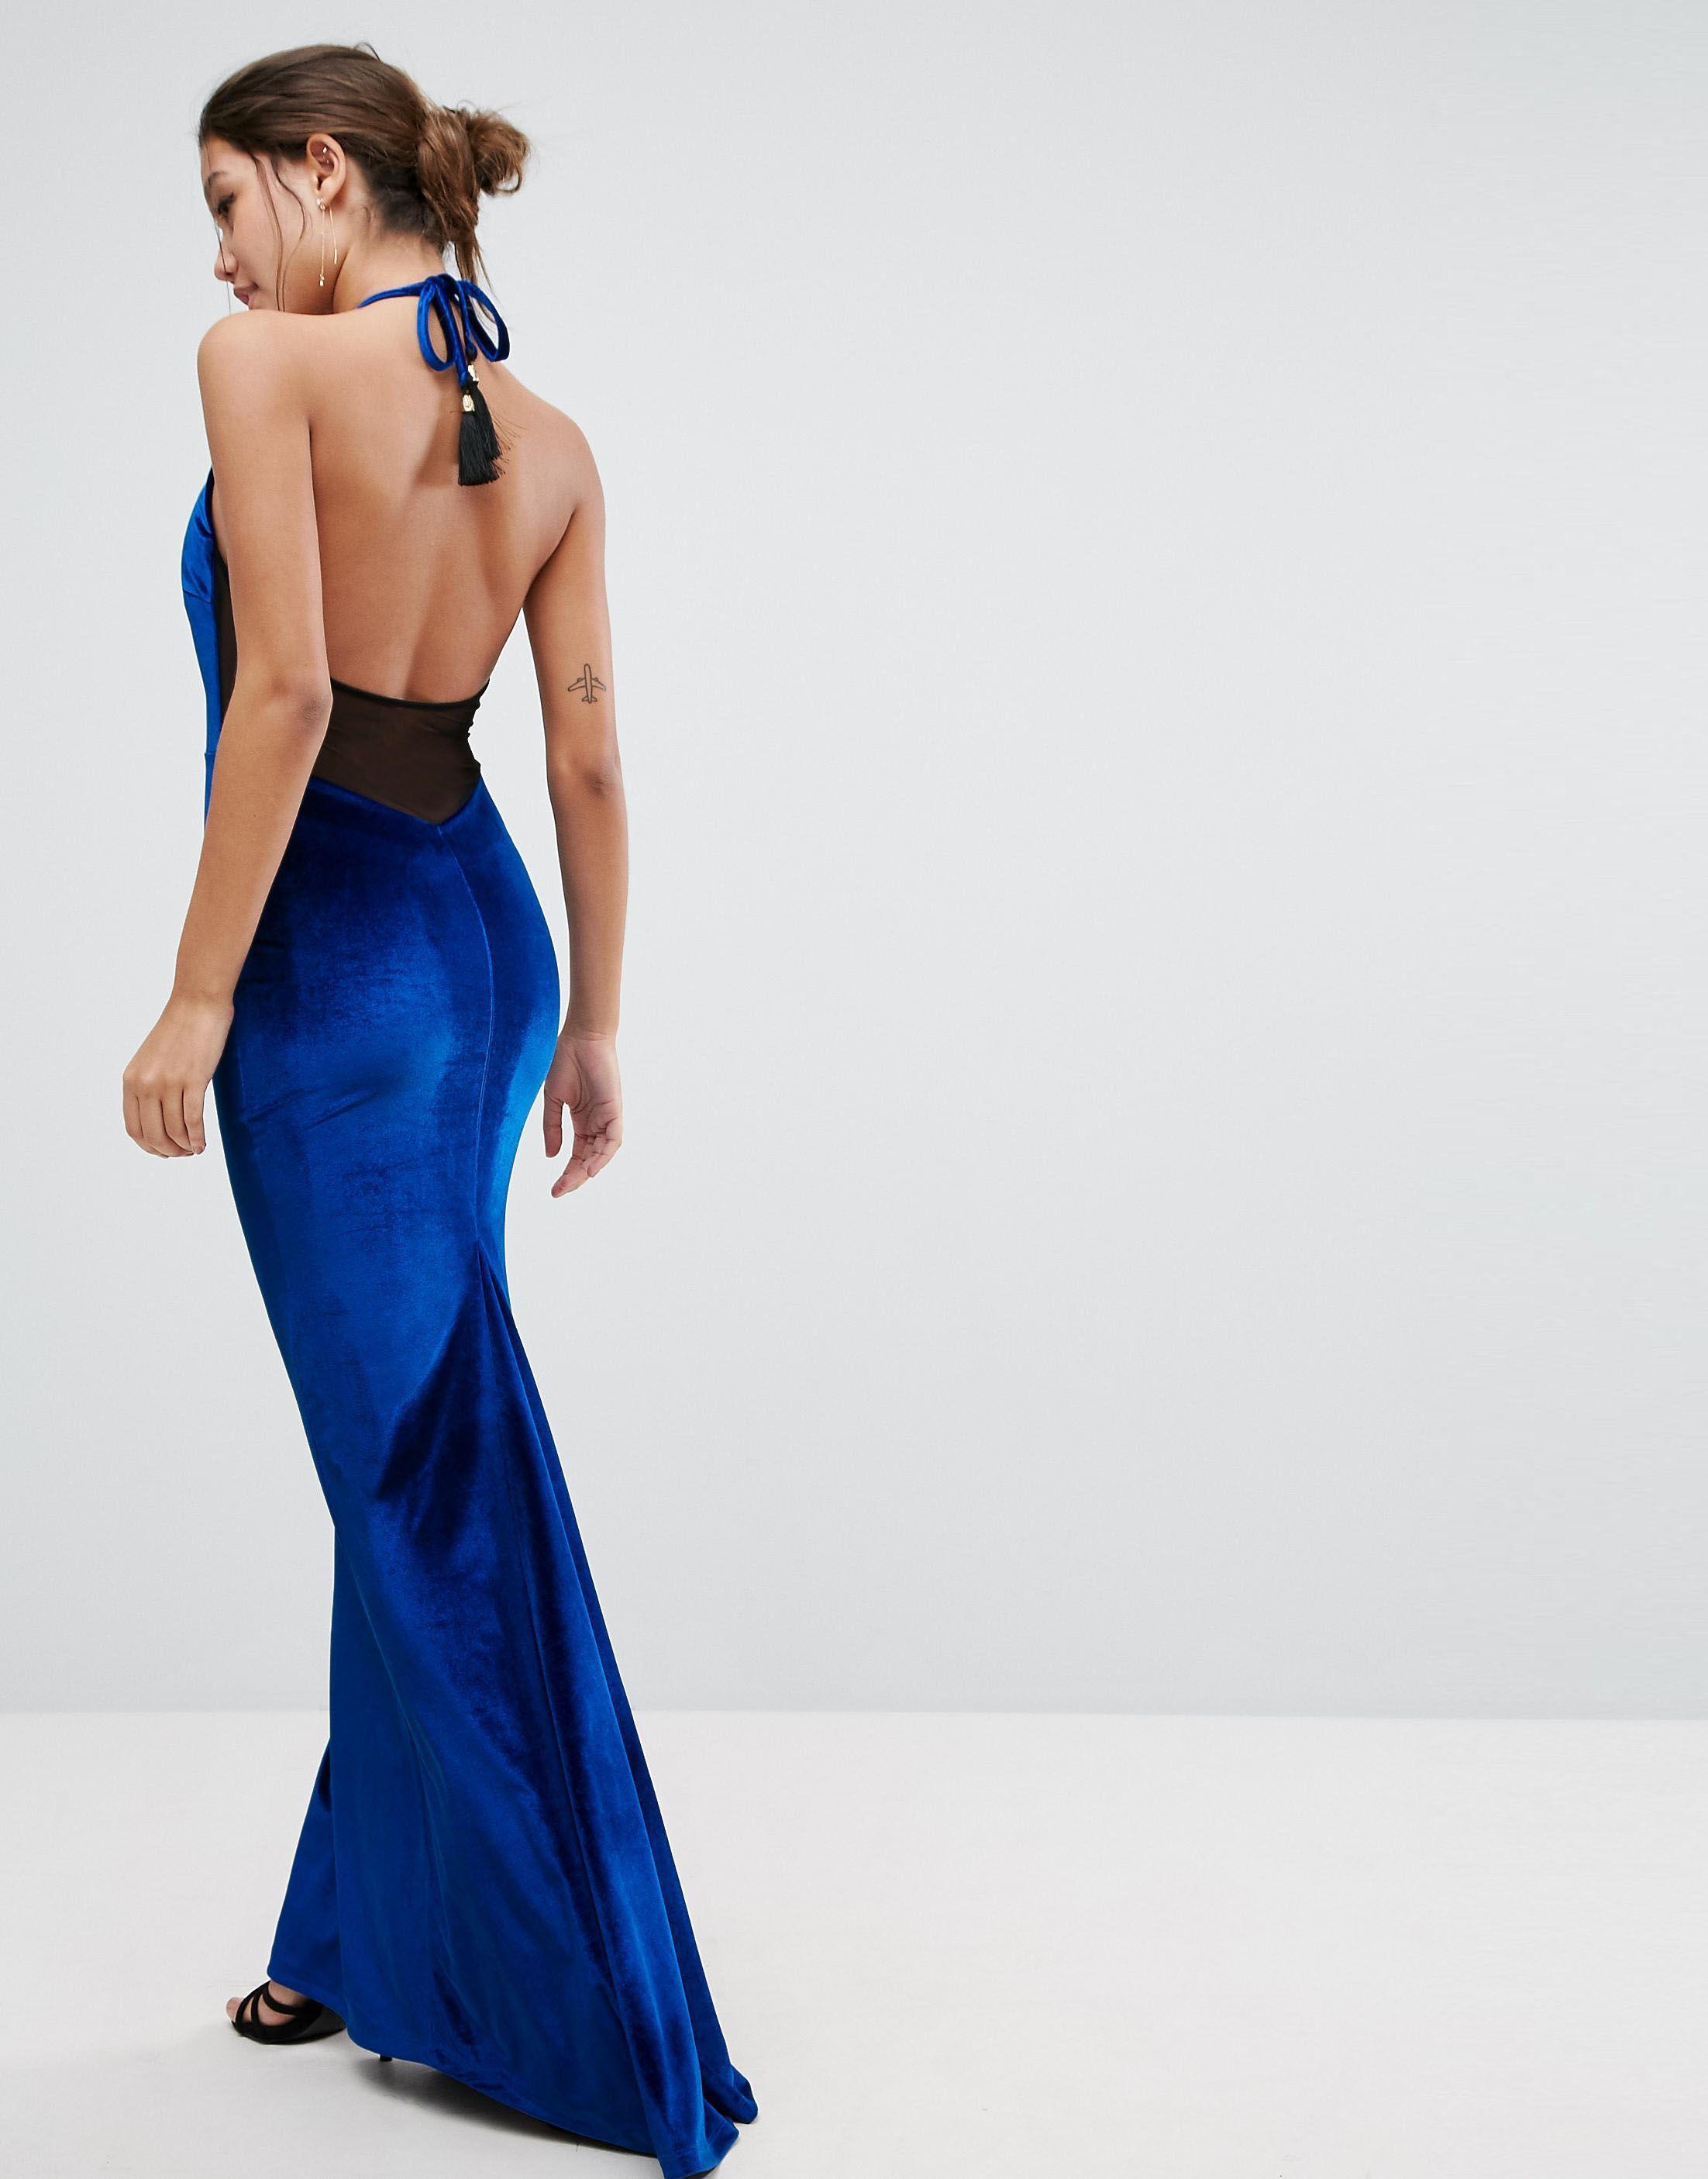 Abiti Da Sera Asos.Asos Velvet High Neck Maxi Dress With Tassel Back Maxi Dress